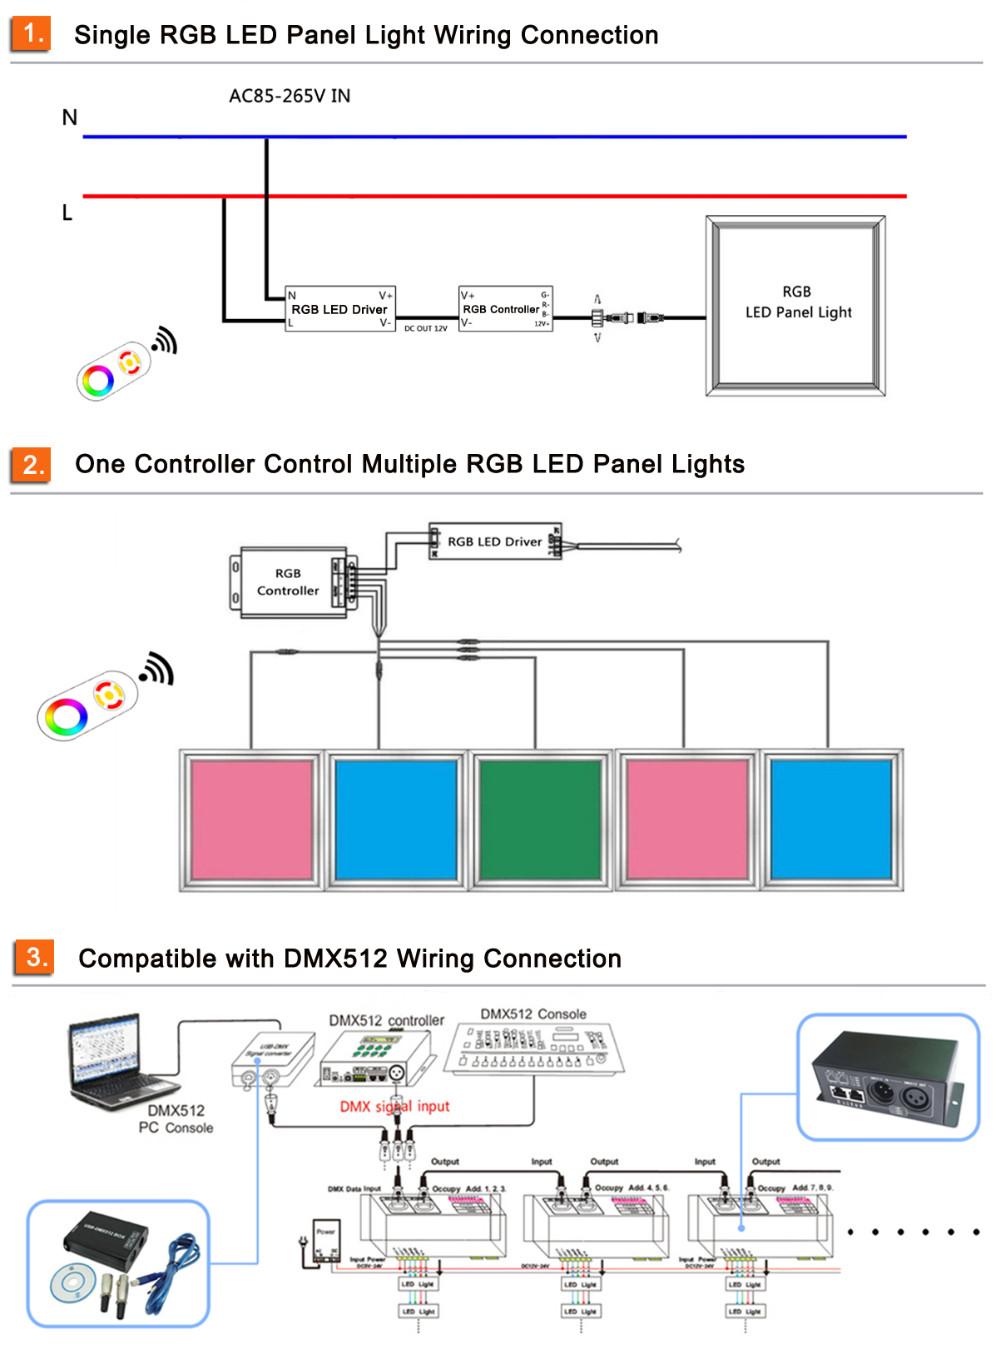 24v 12v Flexible 60x60 Dmx Recessed Multicolor Rgb Led Flat Panel Wiring Diagram Multiple Lights Light